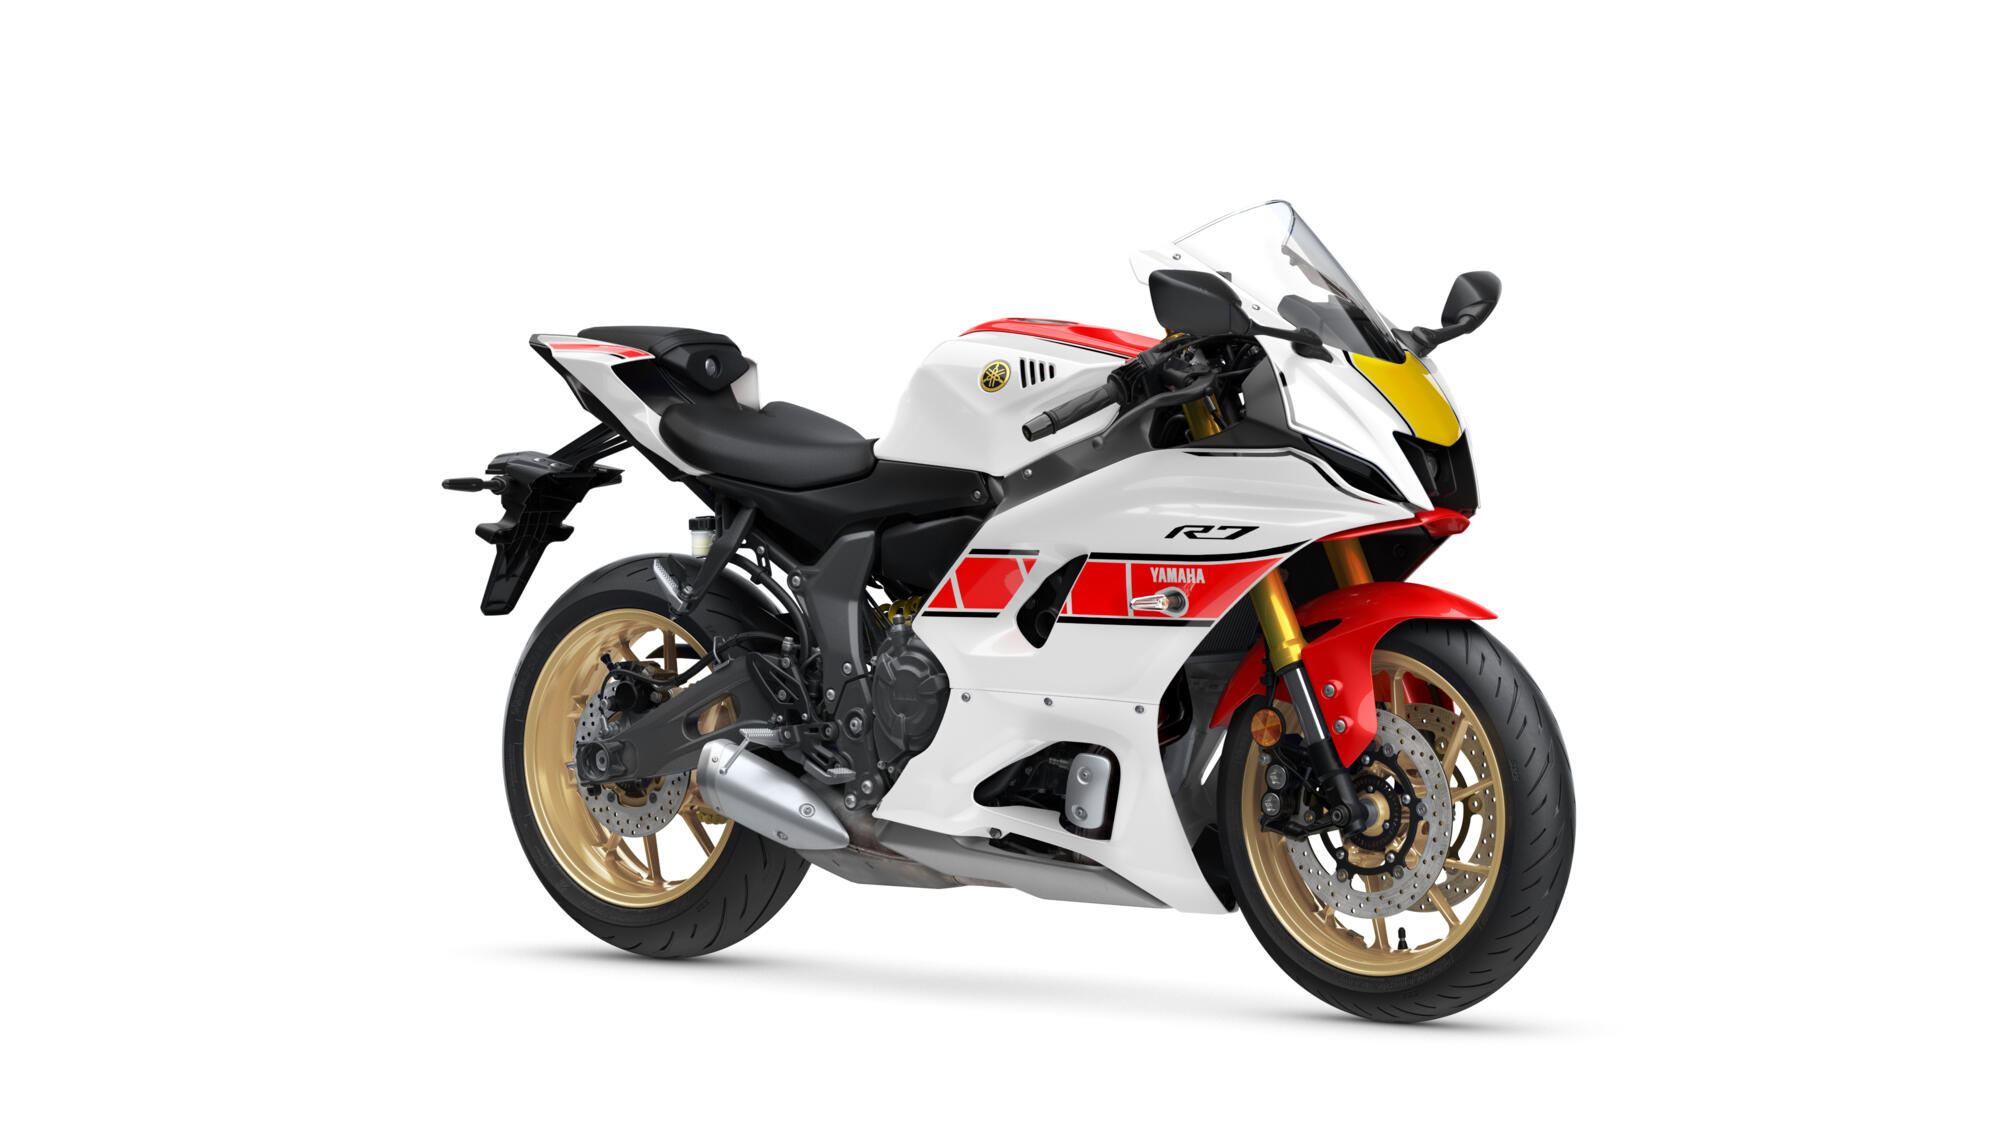 Yamaha R7 60th Anniversary | MotorCentrumWest